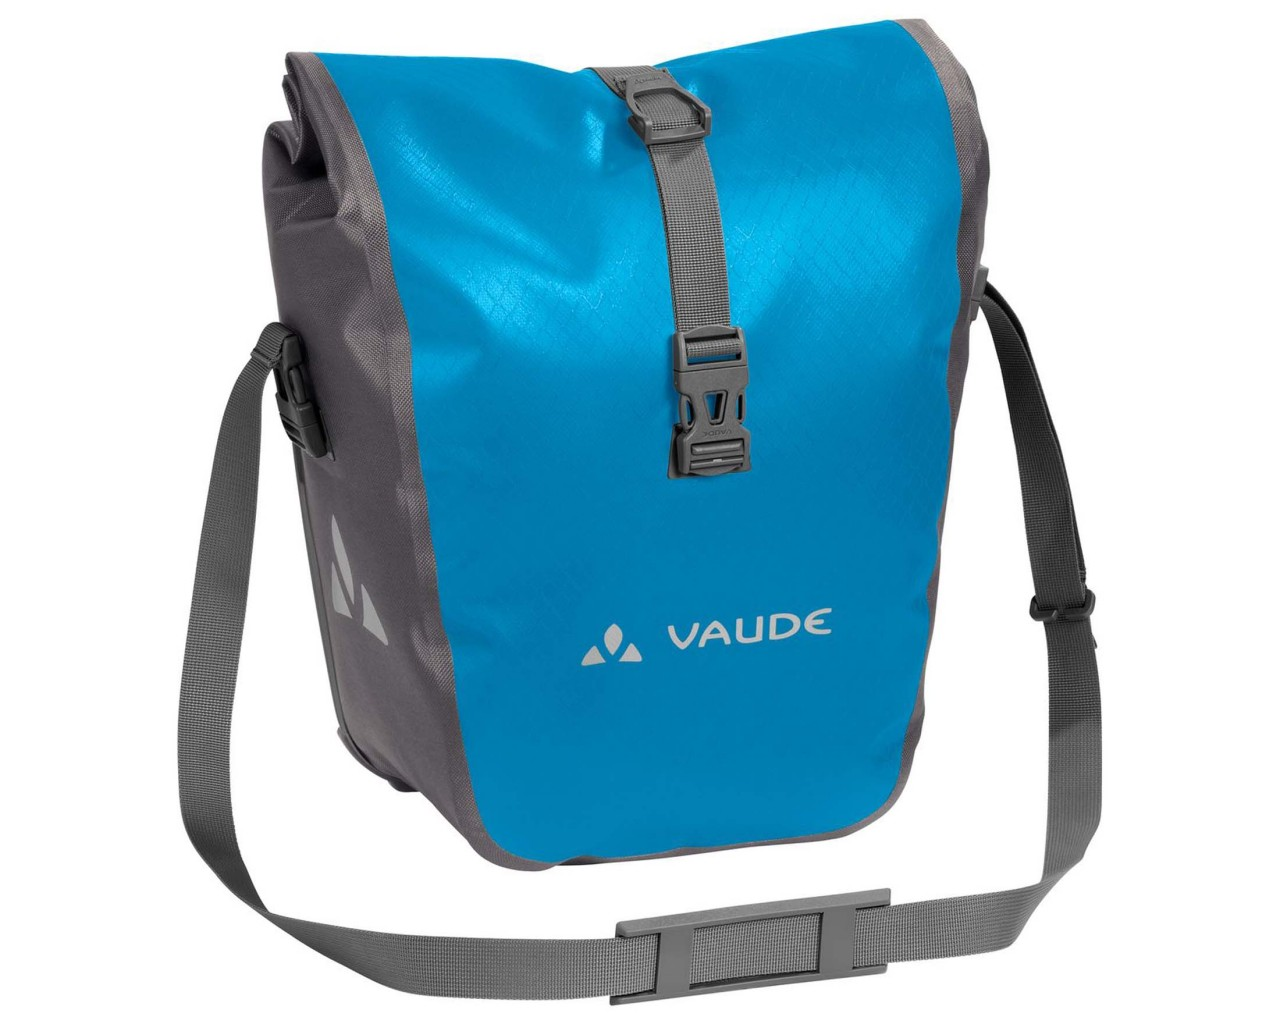 Vaude Aqua Front - wasserdichte Fahrradtaschen PVC-frei (Paar) | icicle